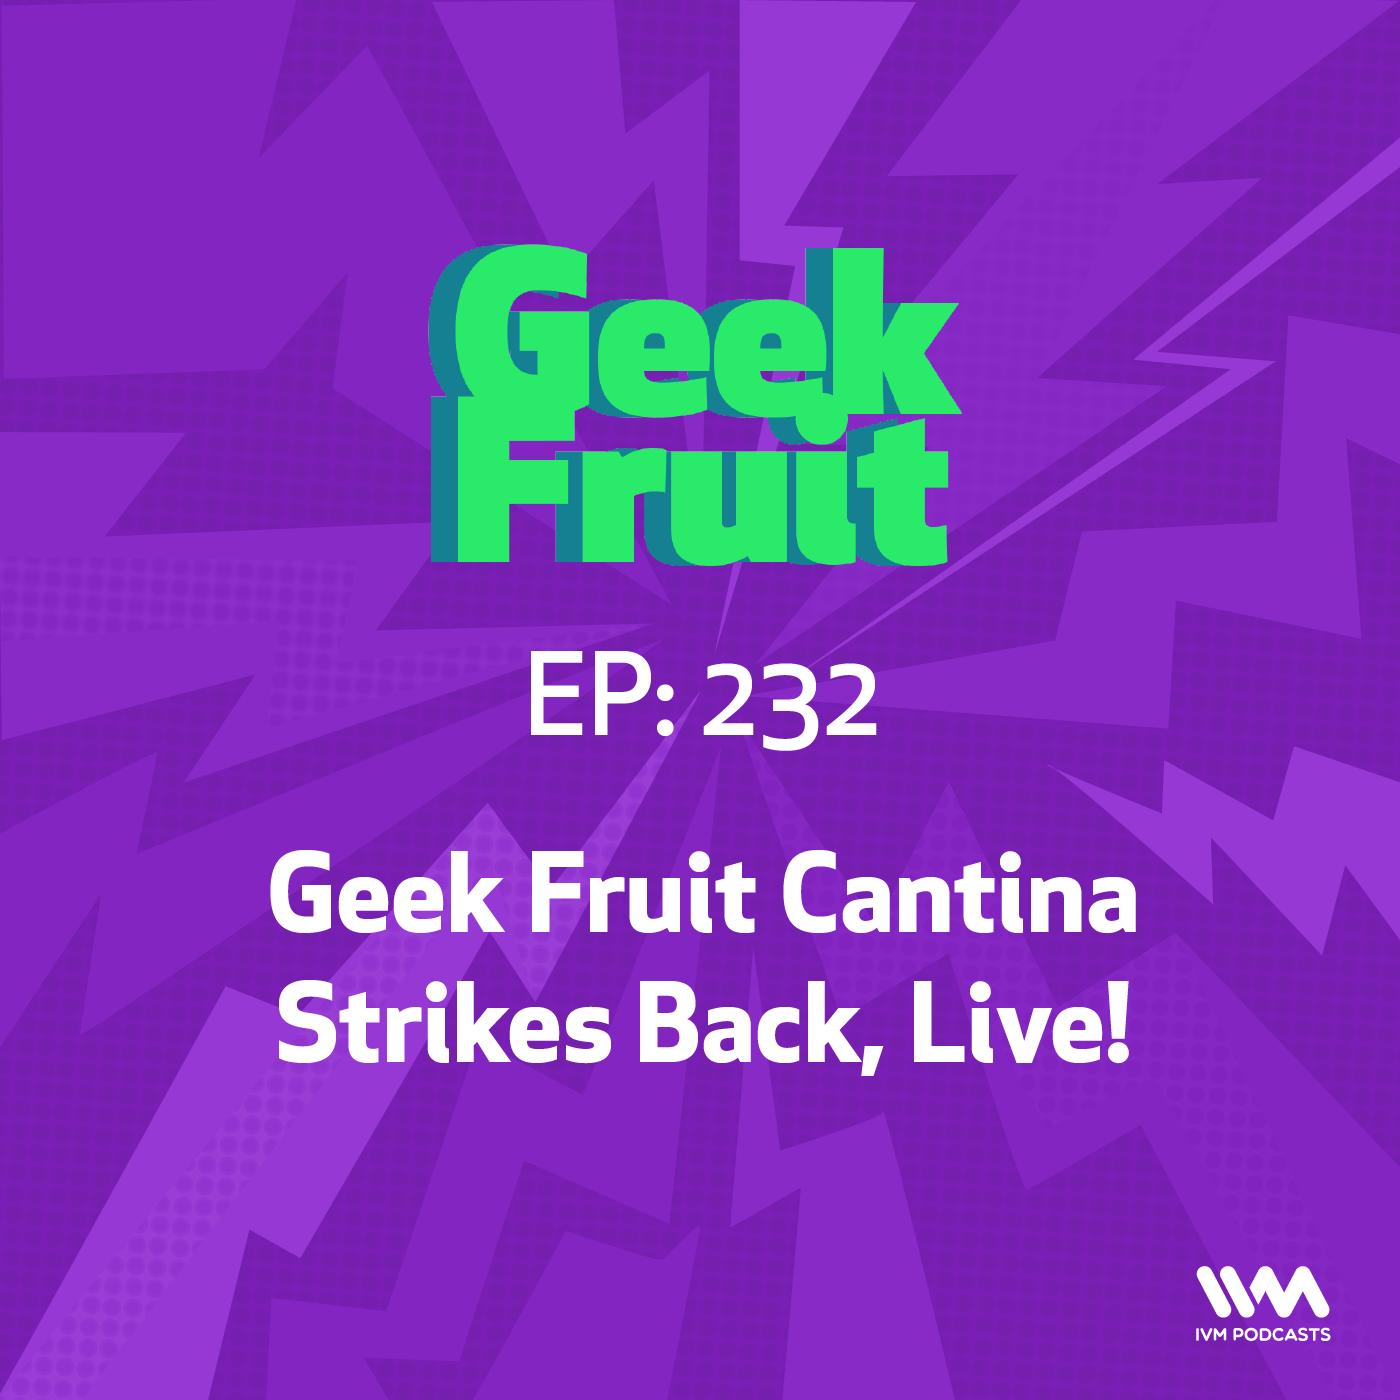 Ep. 232: Geek Fruit Cantina Strikes Back, Live!